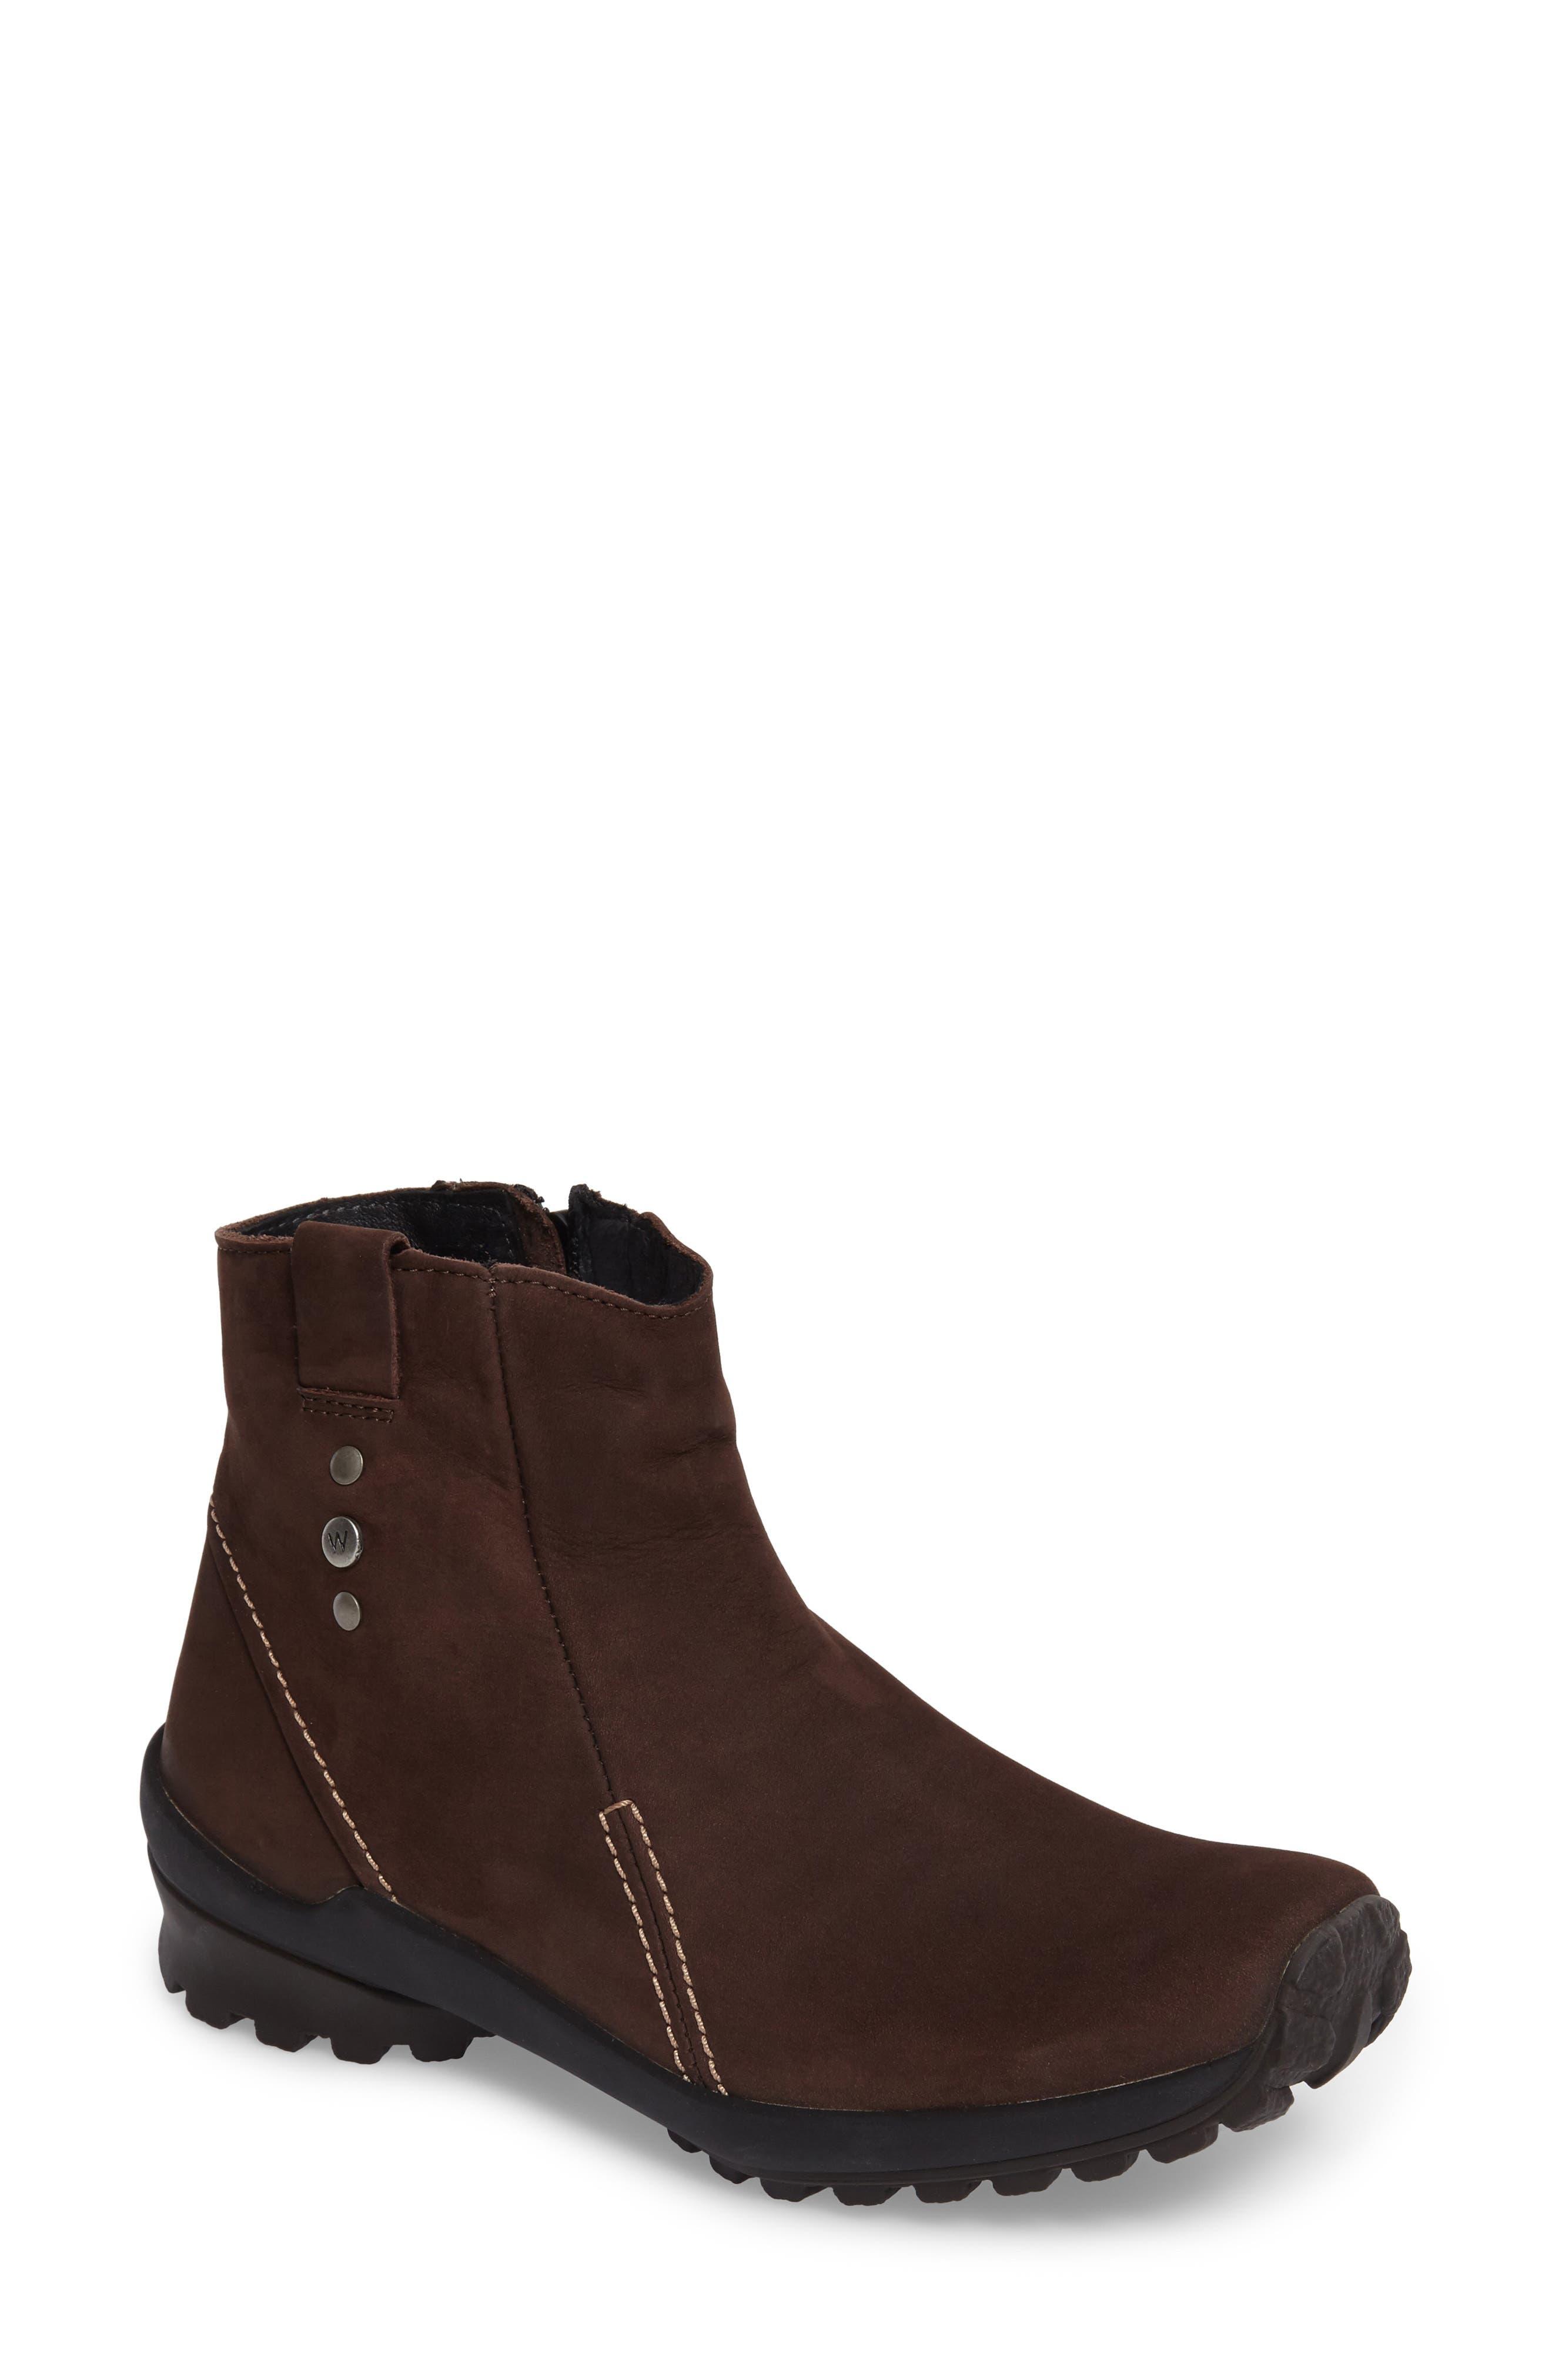 Main Image - Wolky Zion Waterproof Insulated Winter Boot (Women)